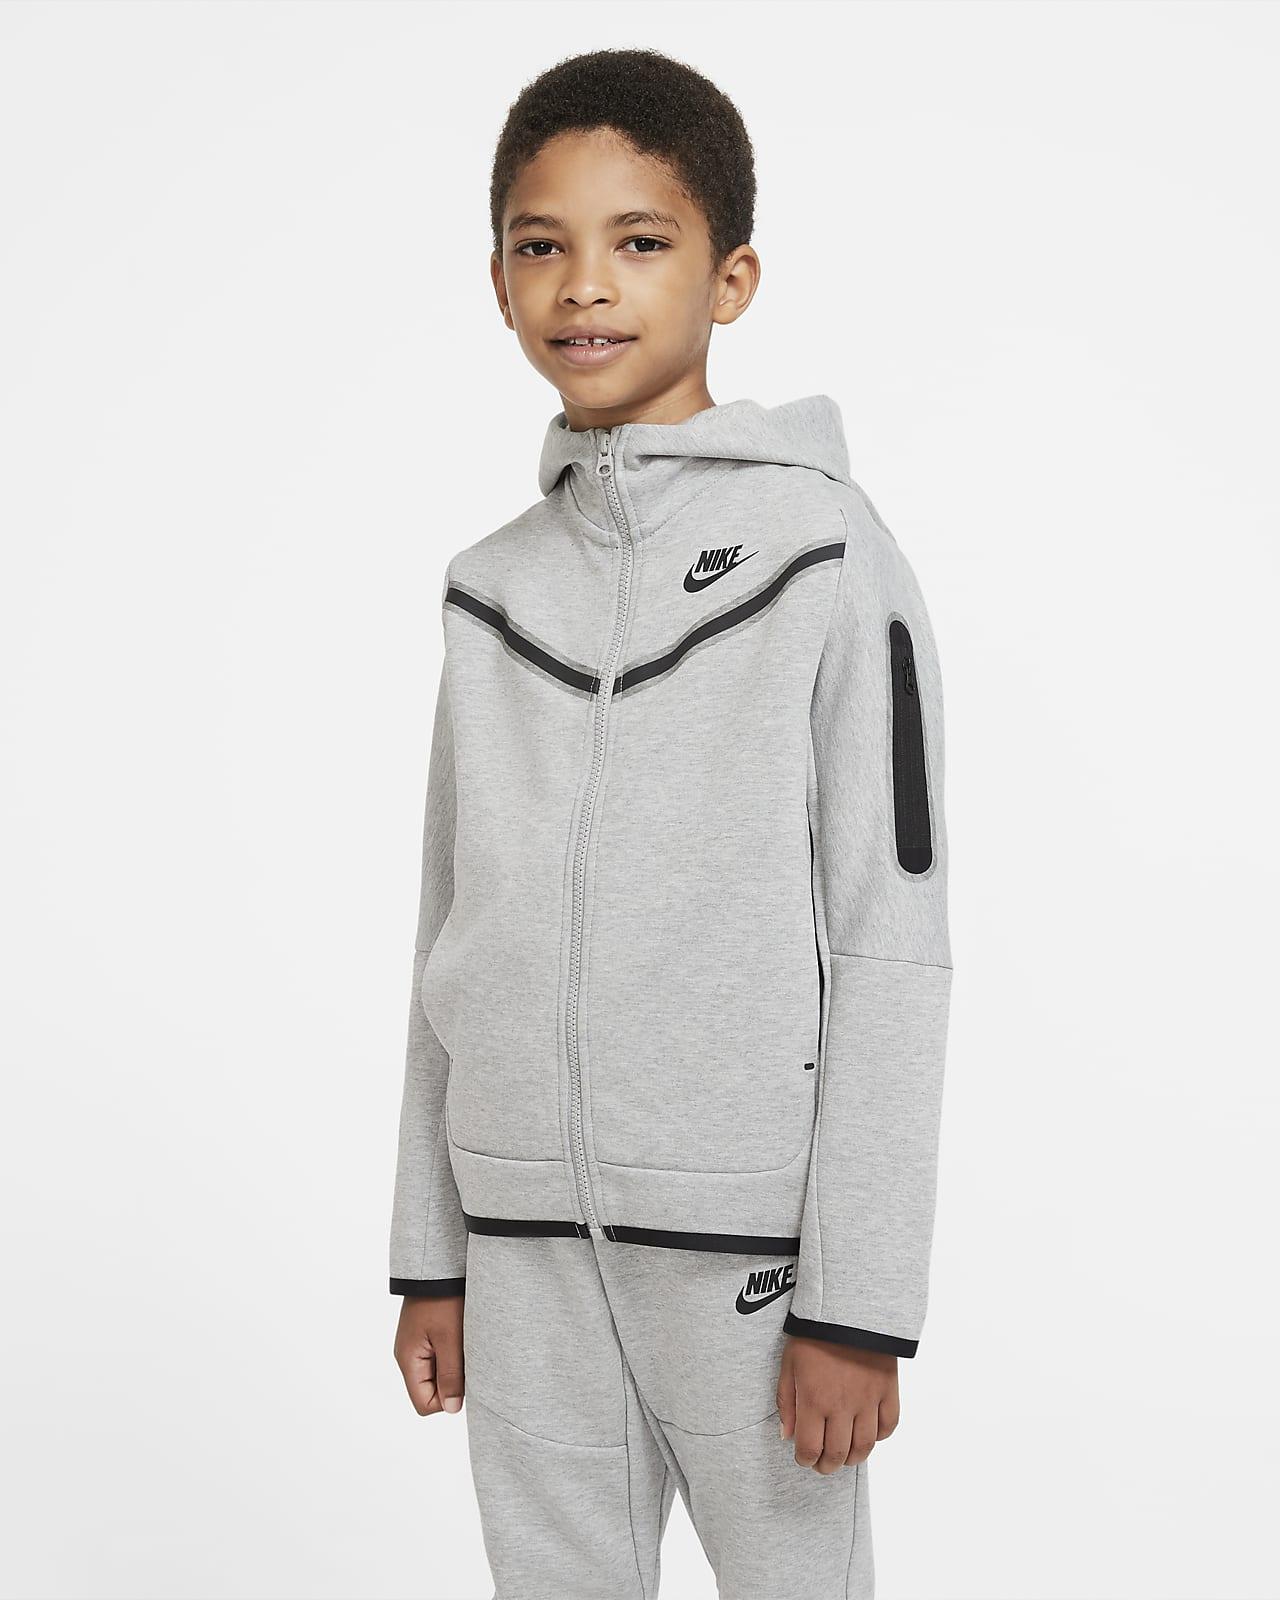 Hoodie com fecho completo Nike Sportswear Tech Fleece Júnior (Rapaz)